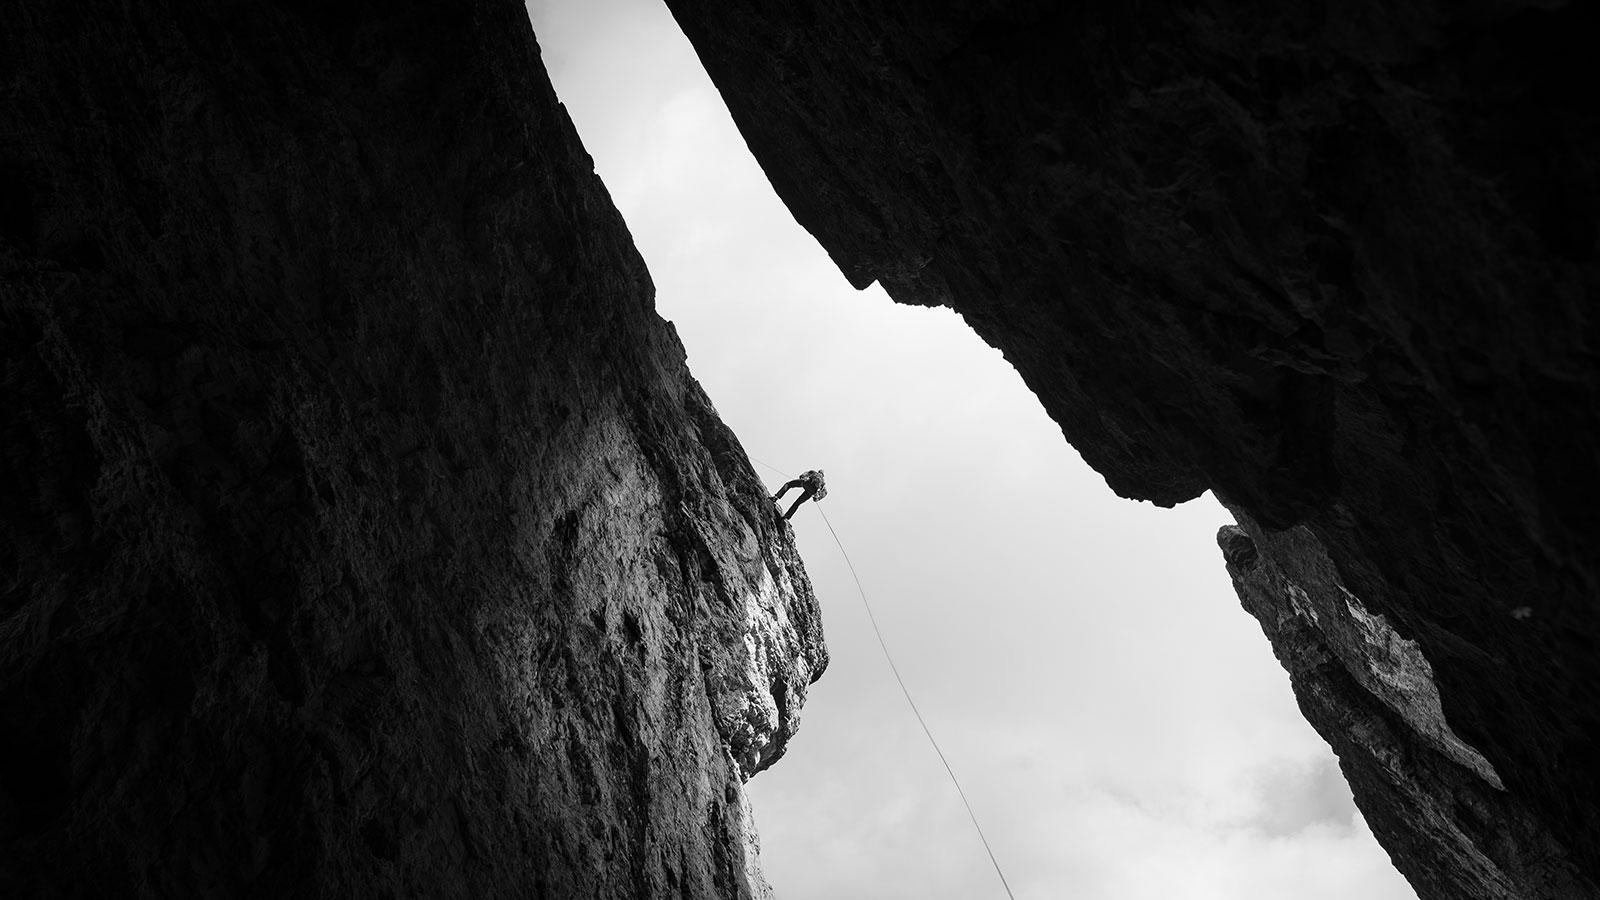 Abseilen. Klettern in den Dolomiten | Pauli Trenkwalder, Berge & Psychologie